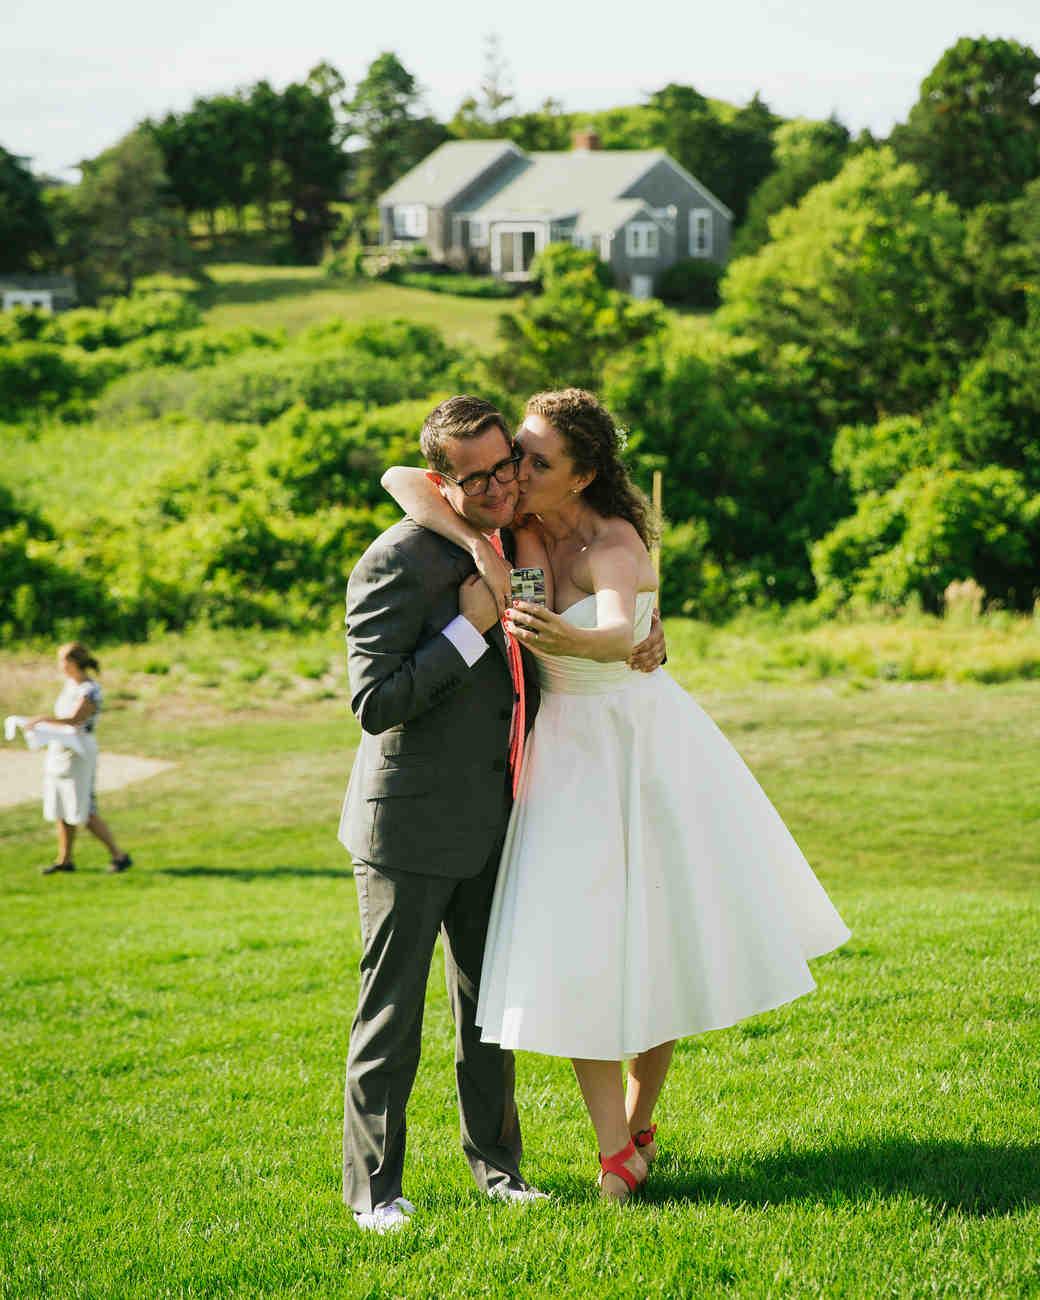 gabriela-tyson-wedding-selfie-0502-s111708-1214.jpg